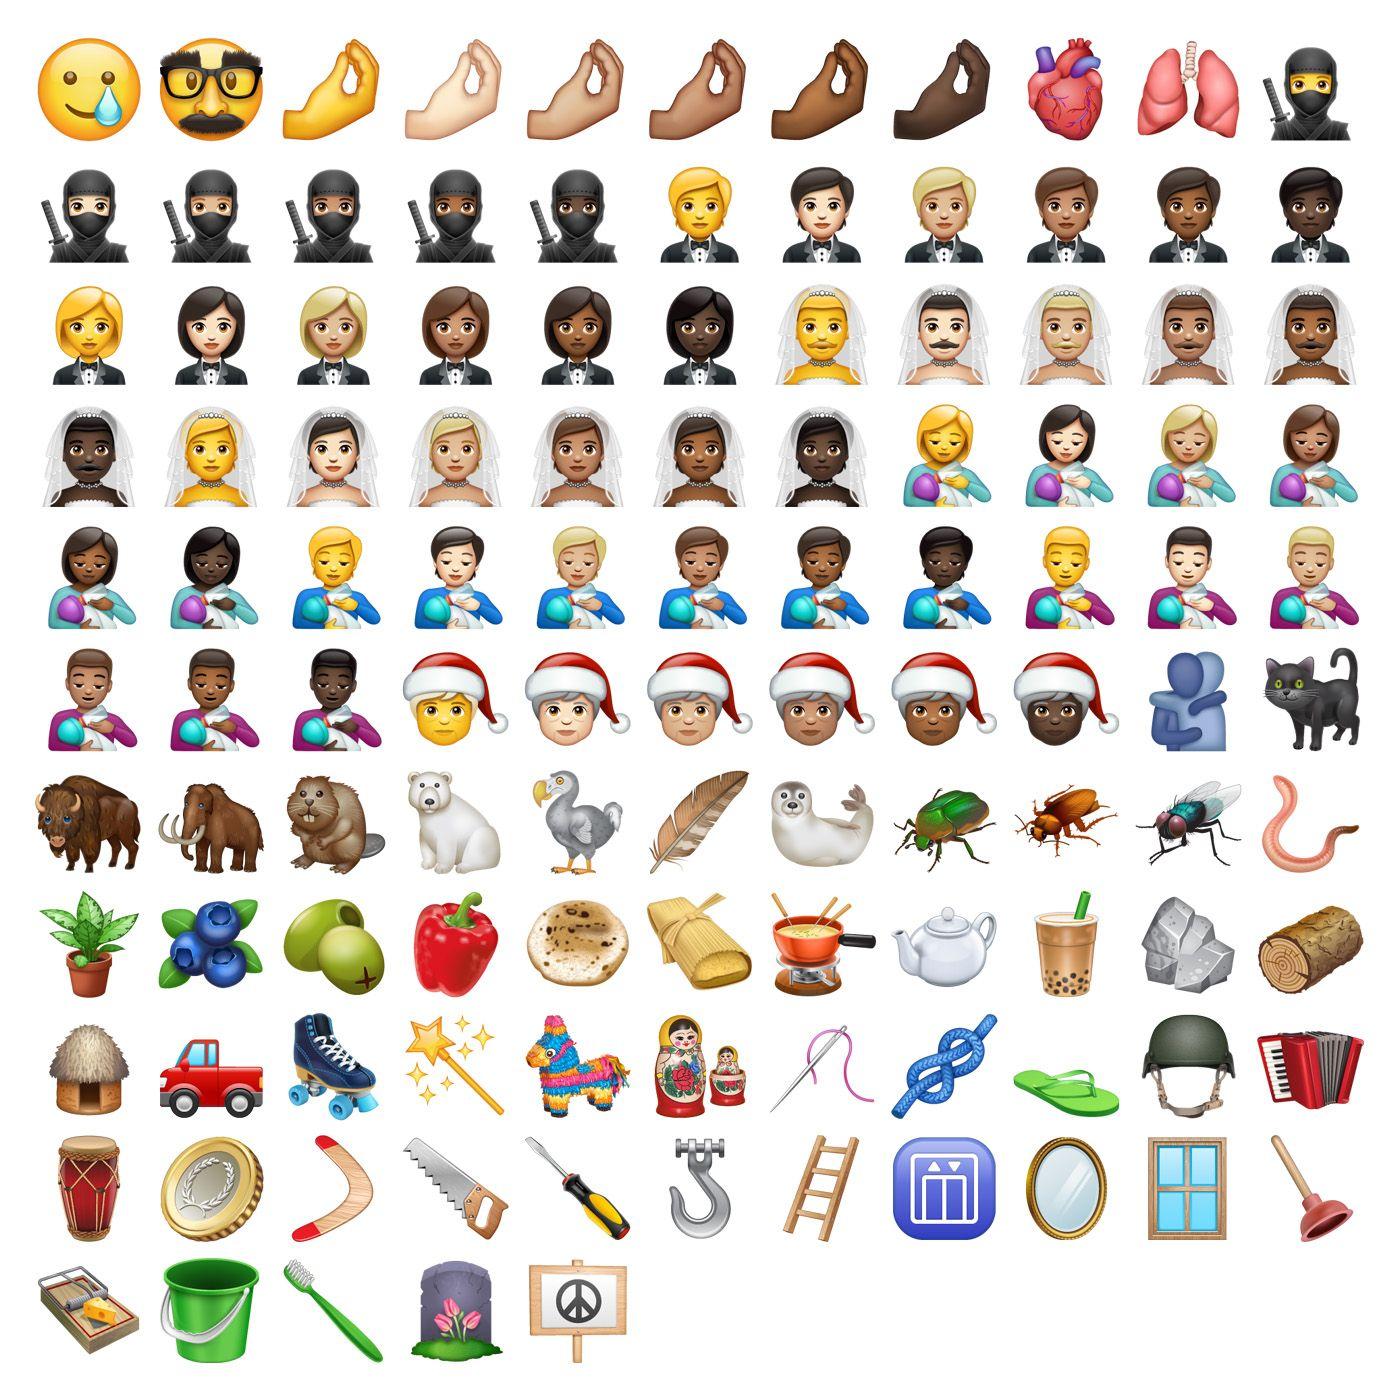 Emojipedia-WhatsApp-December-2020-All-New-Emojis-Emoji-13